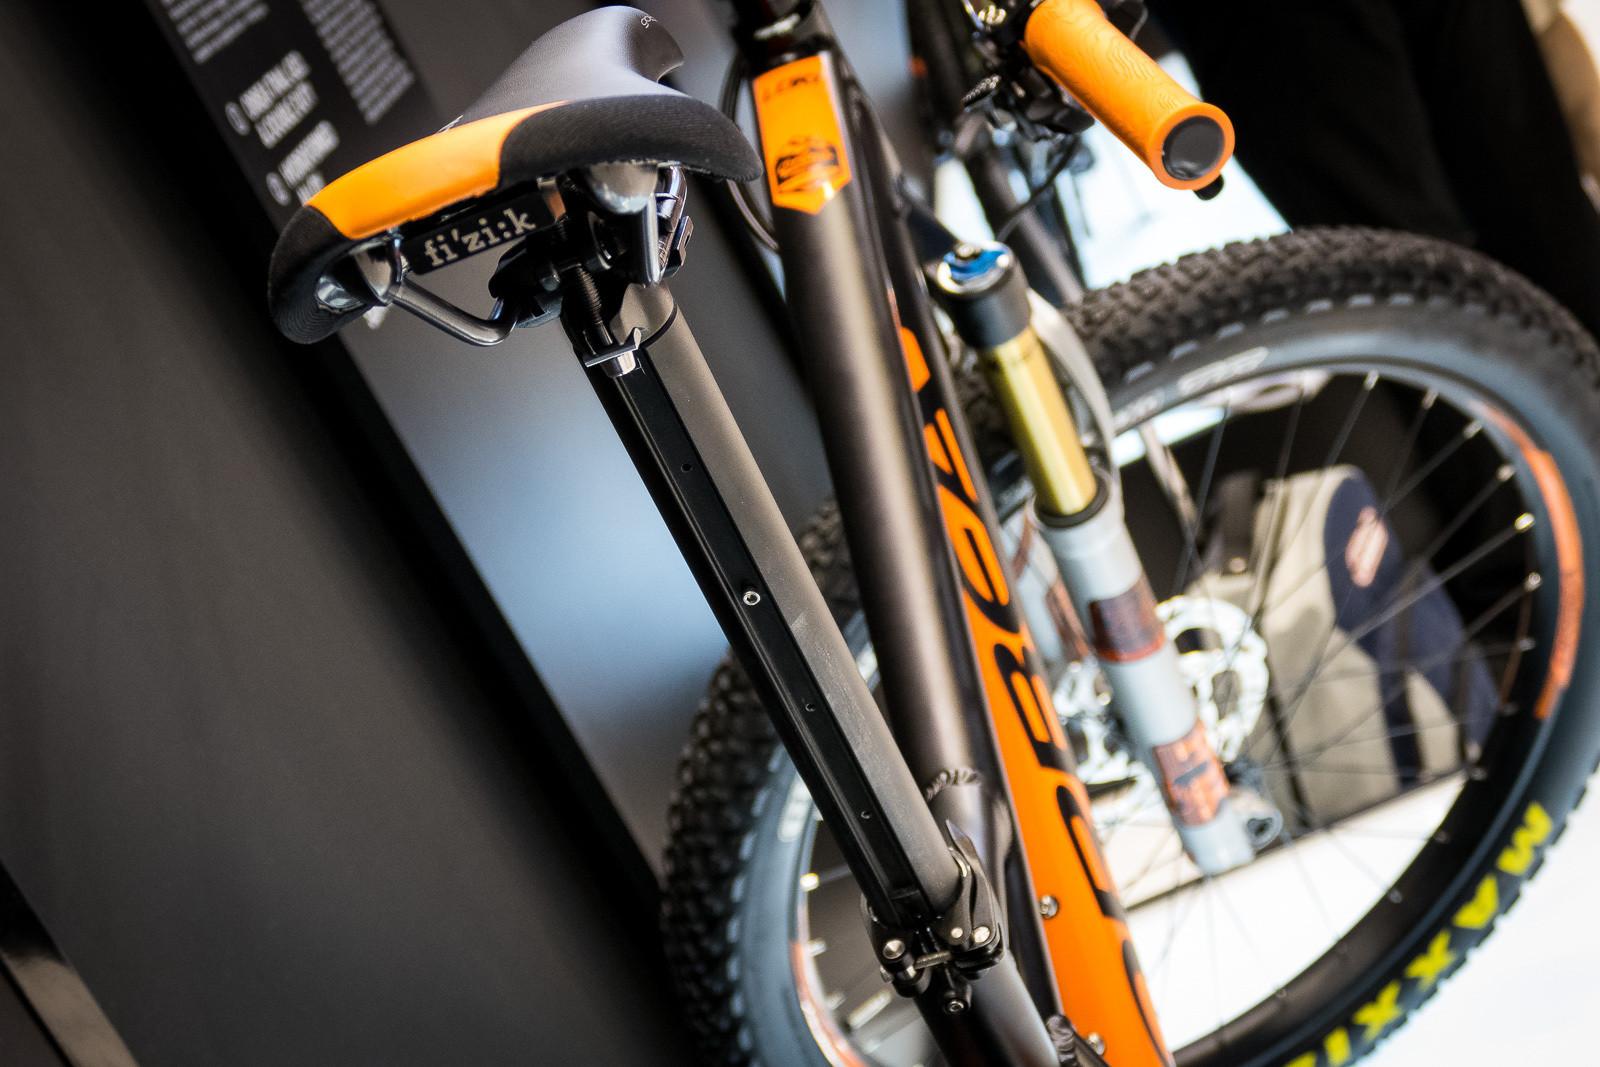 Orbea Digit Seatpost - A Dropper Alternative - 2016 Mountain Bike Components at Eurobike - Mountain Biking Pictures - Vital MTB